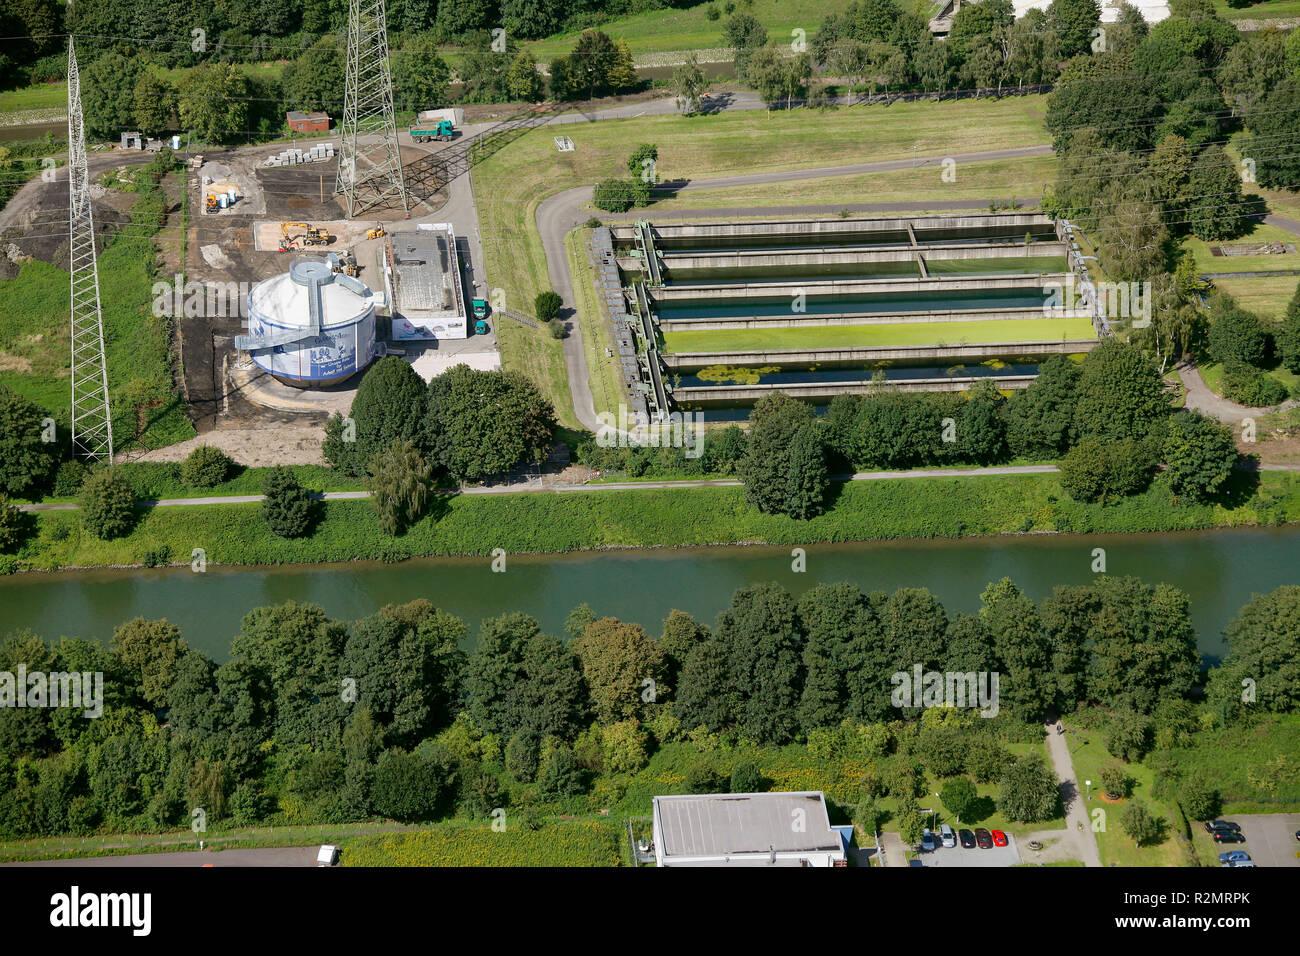 Aerial view, Emscher, Art, Silke Wagner Glückauf miners' protests in the Ruhr area digestion tank, Recklinghausen, Emscherkunst.2010, art works at the Emscher, Ruhr area, North Rhine-Westphalia, Germany, Europe, - Stock Image